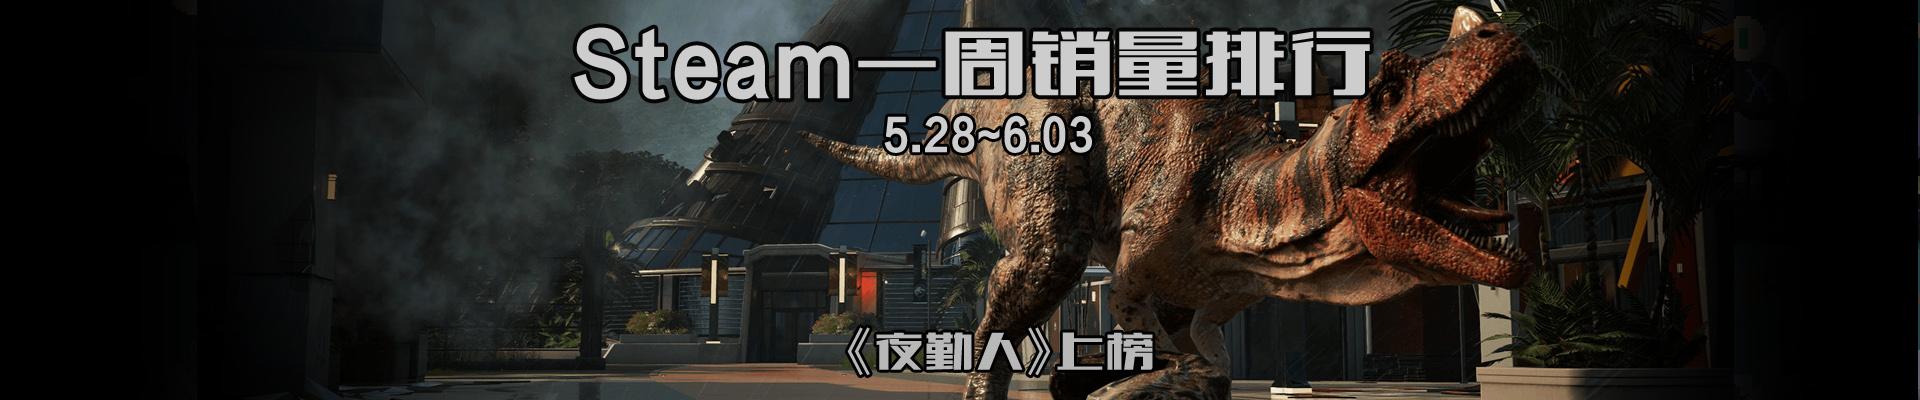 Steam周销量排行:《侏罗纪世纪:进化》登顶